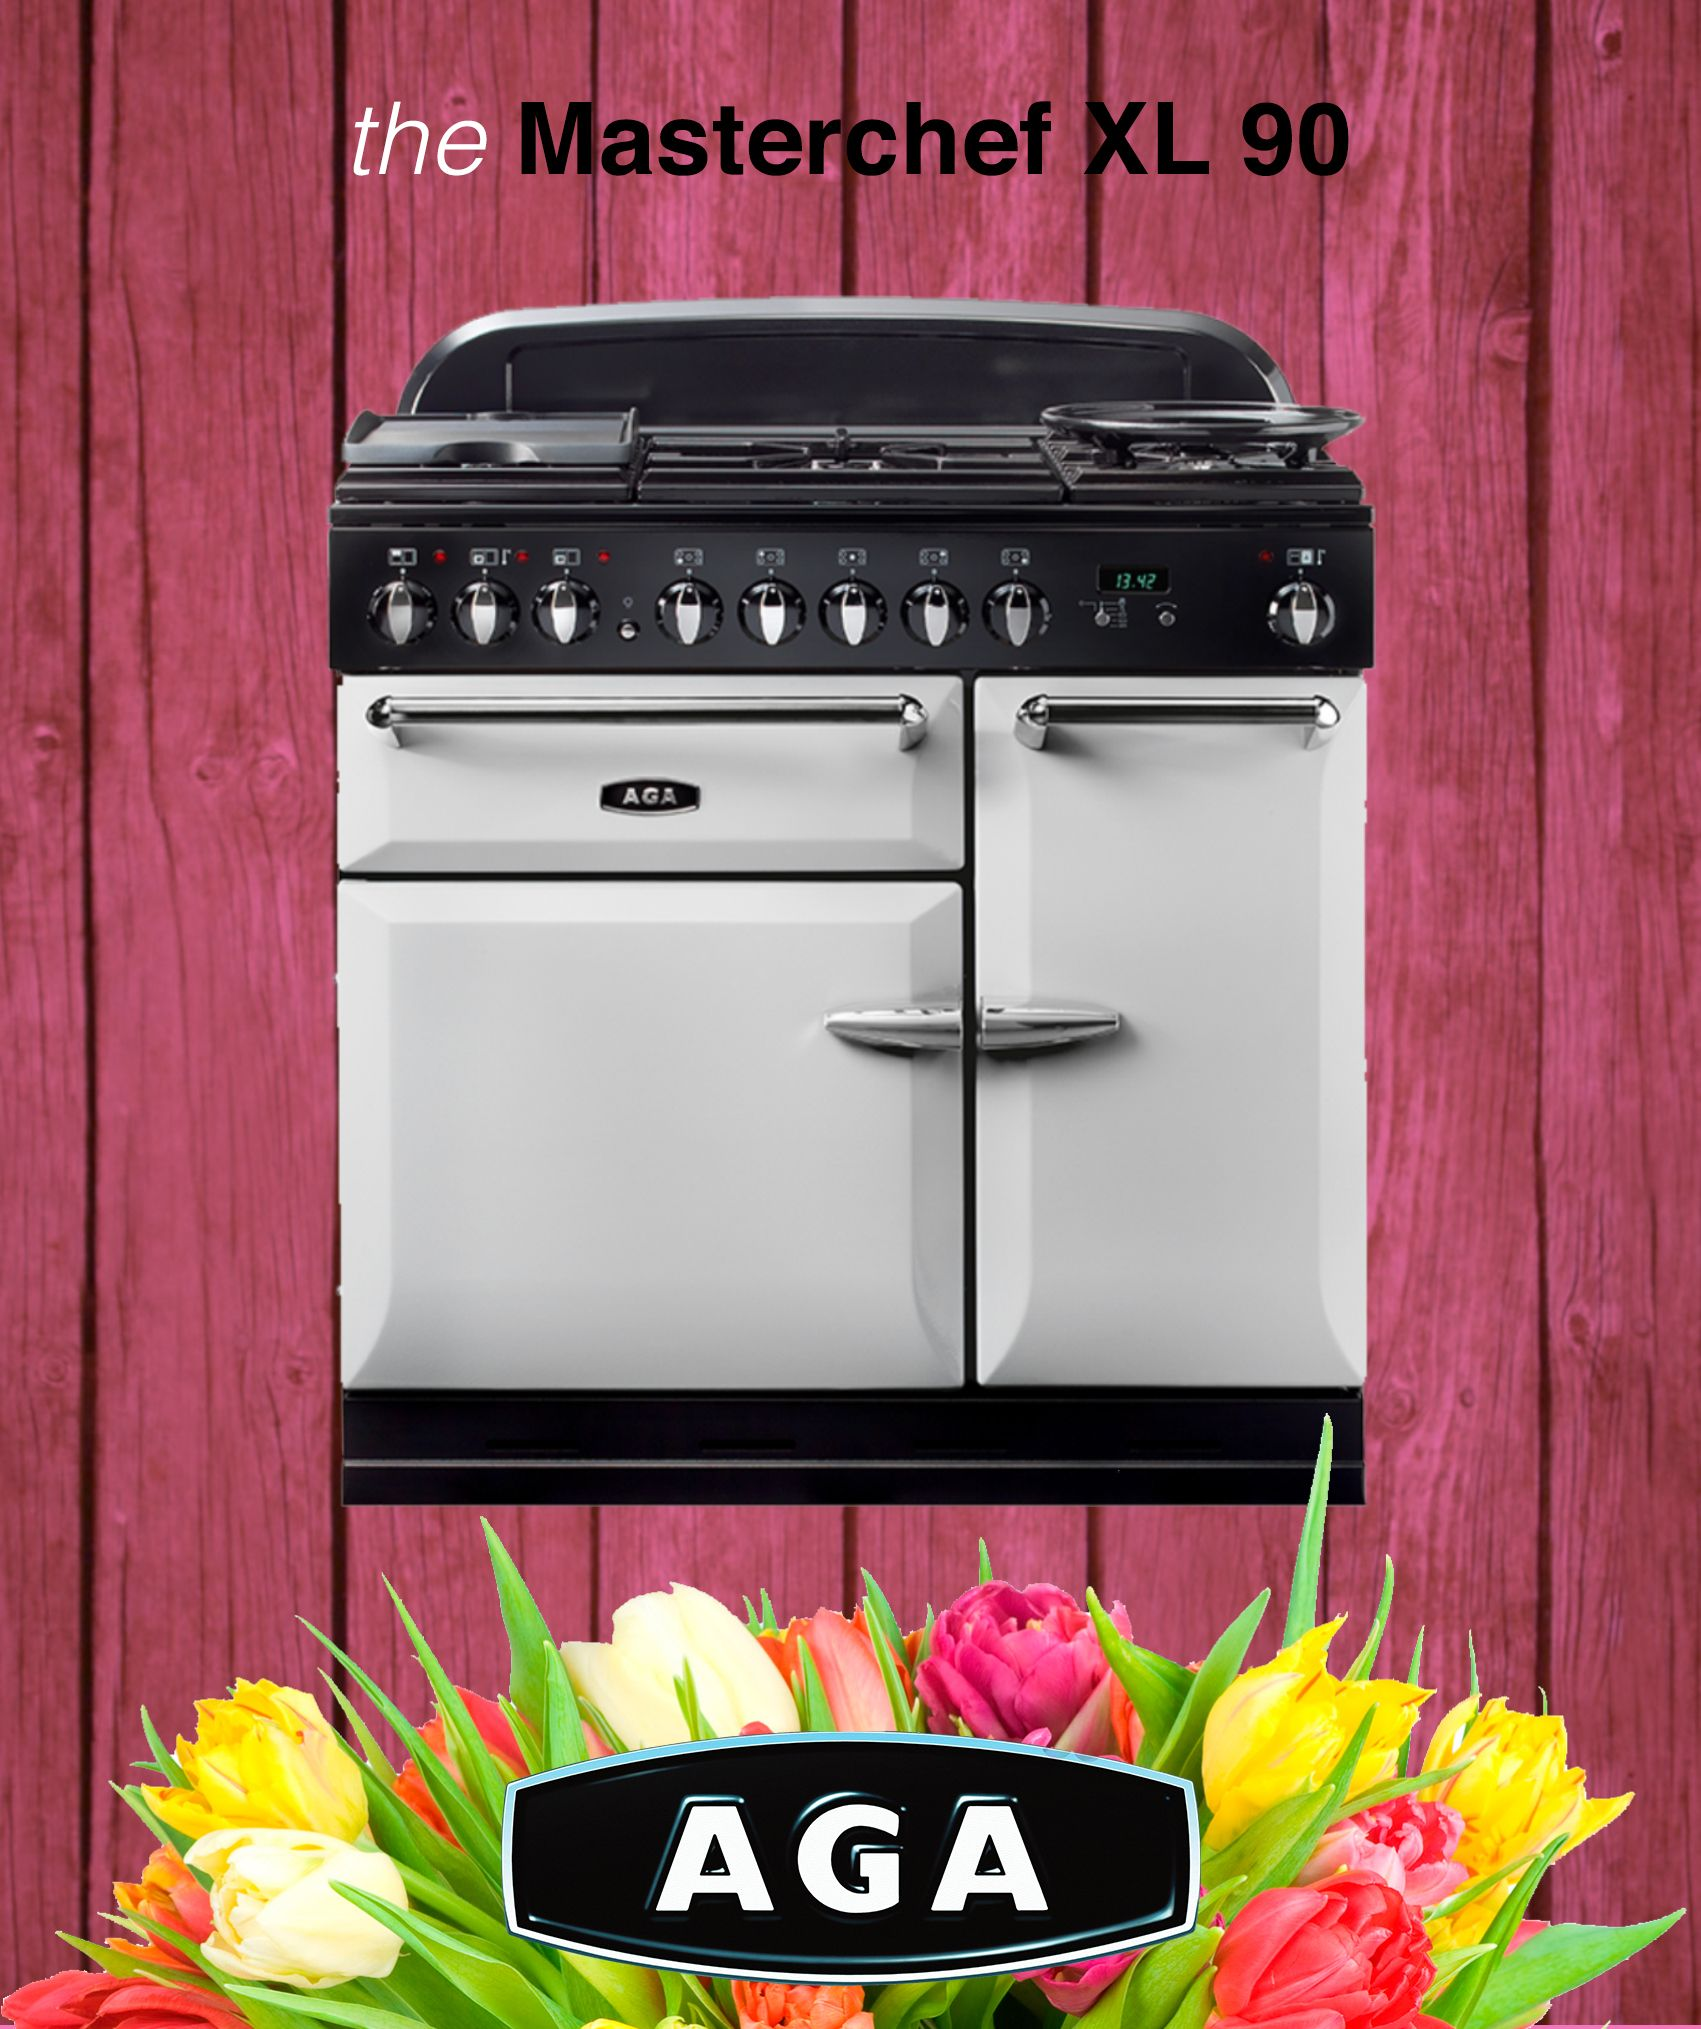 Masterchef Kitchen Appliances Aga Masterchef Xl Fornuizen Pinterest Aga